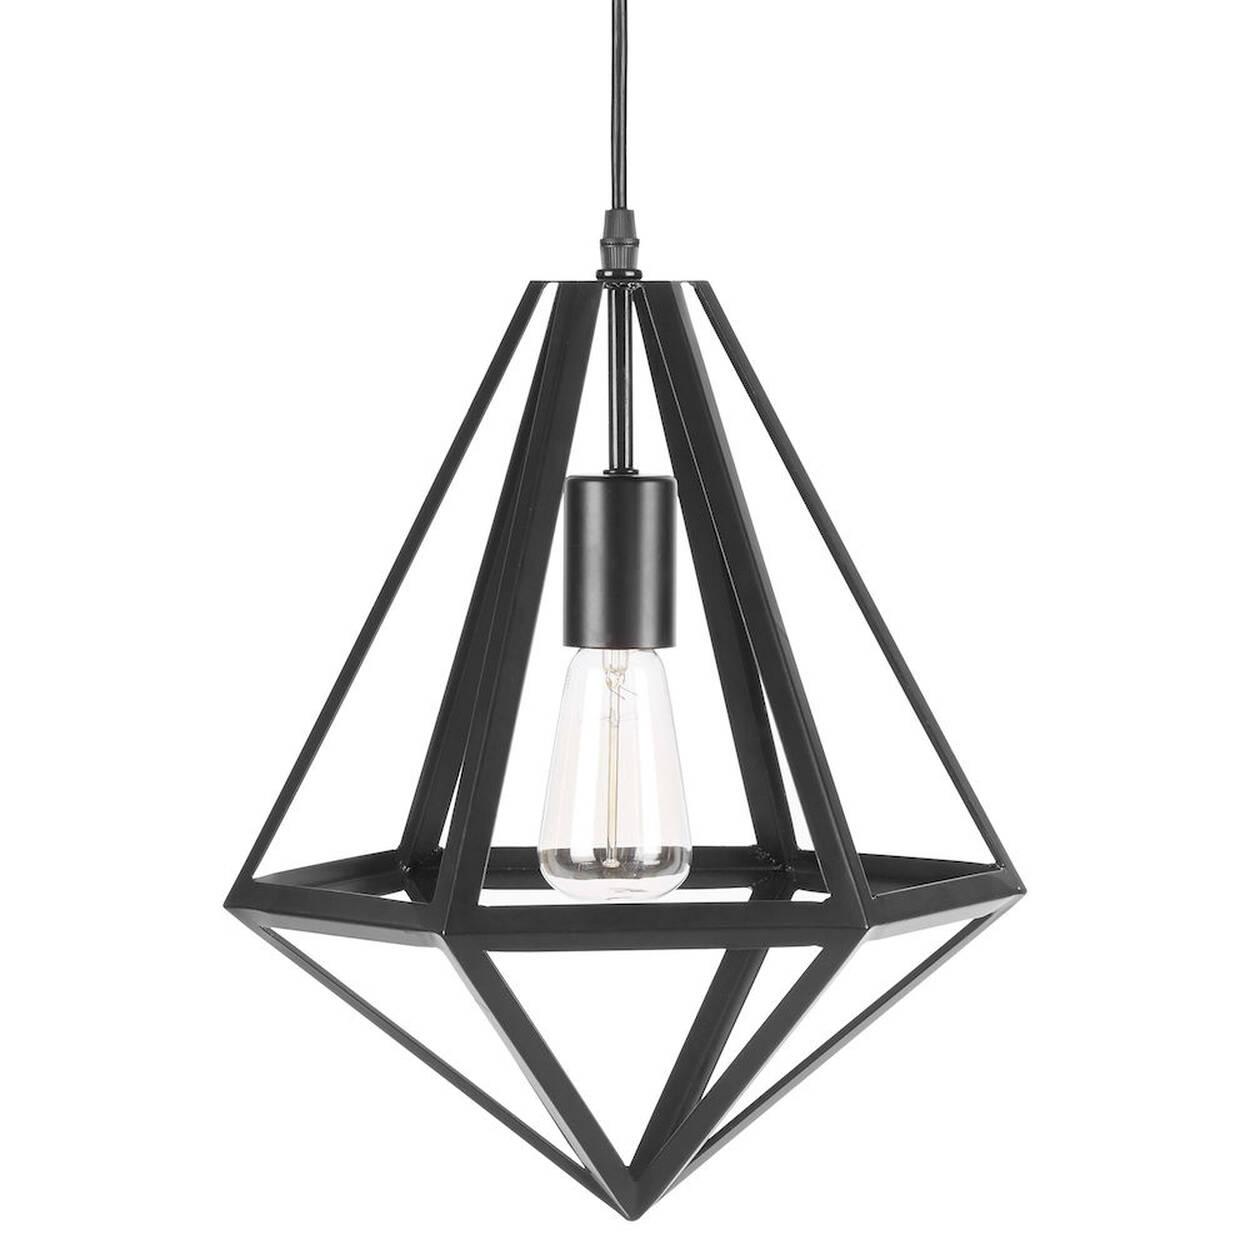 Metal Diamond Ceiling Lamp